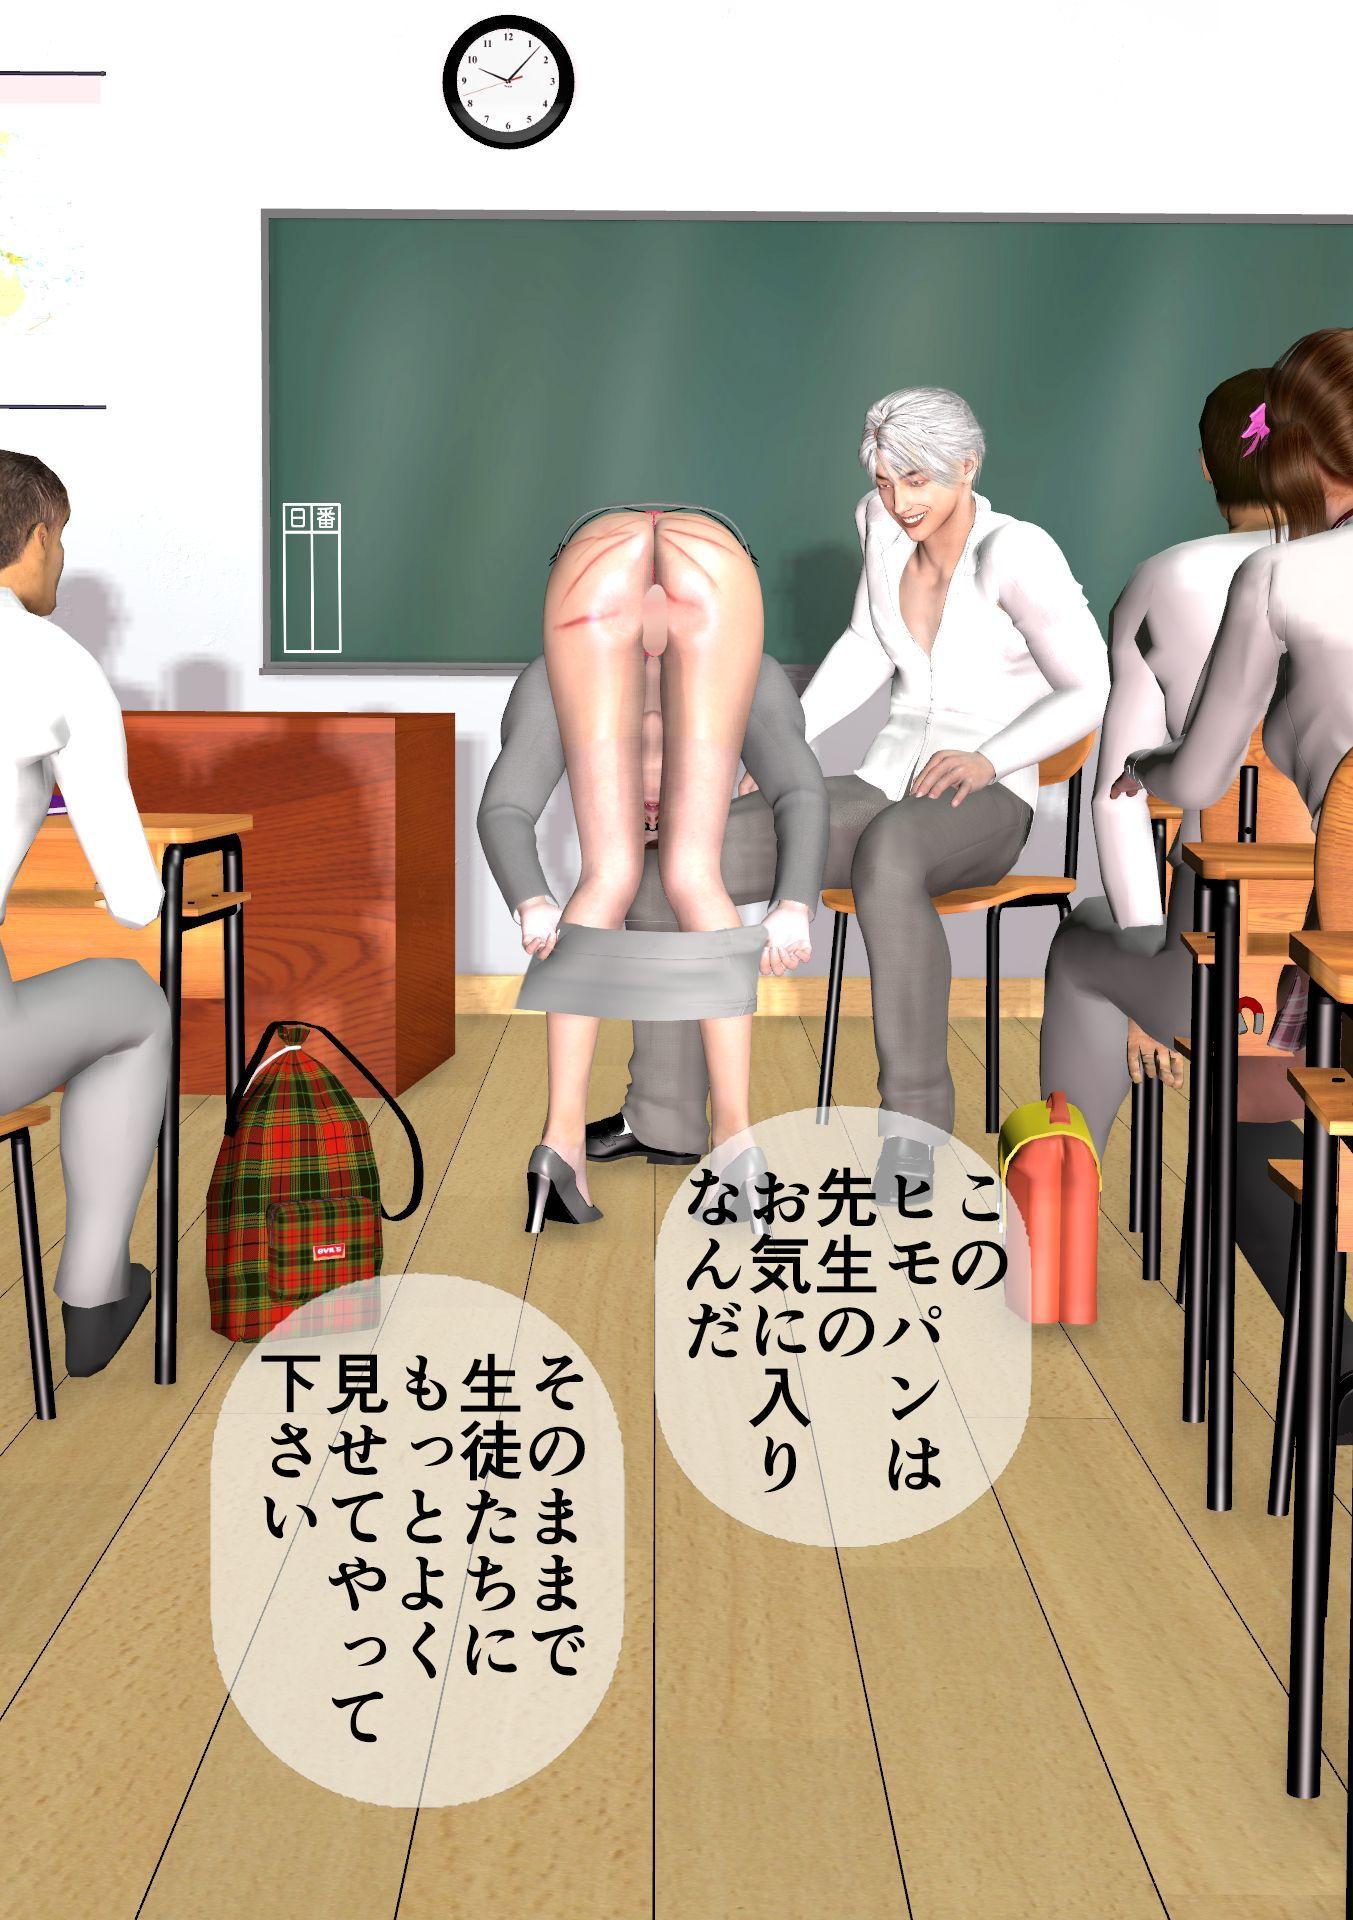 英語女教師明美 穴調教 第7話 穴いじり授業